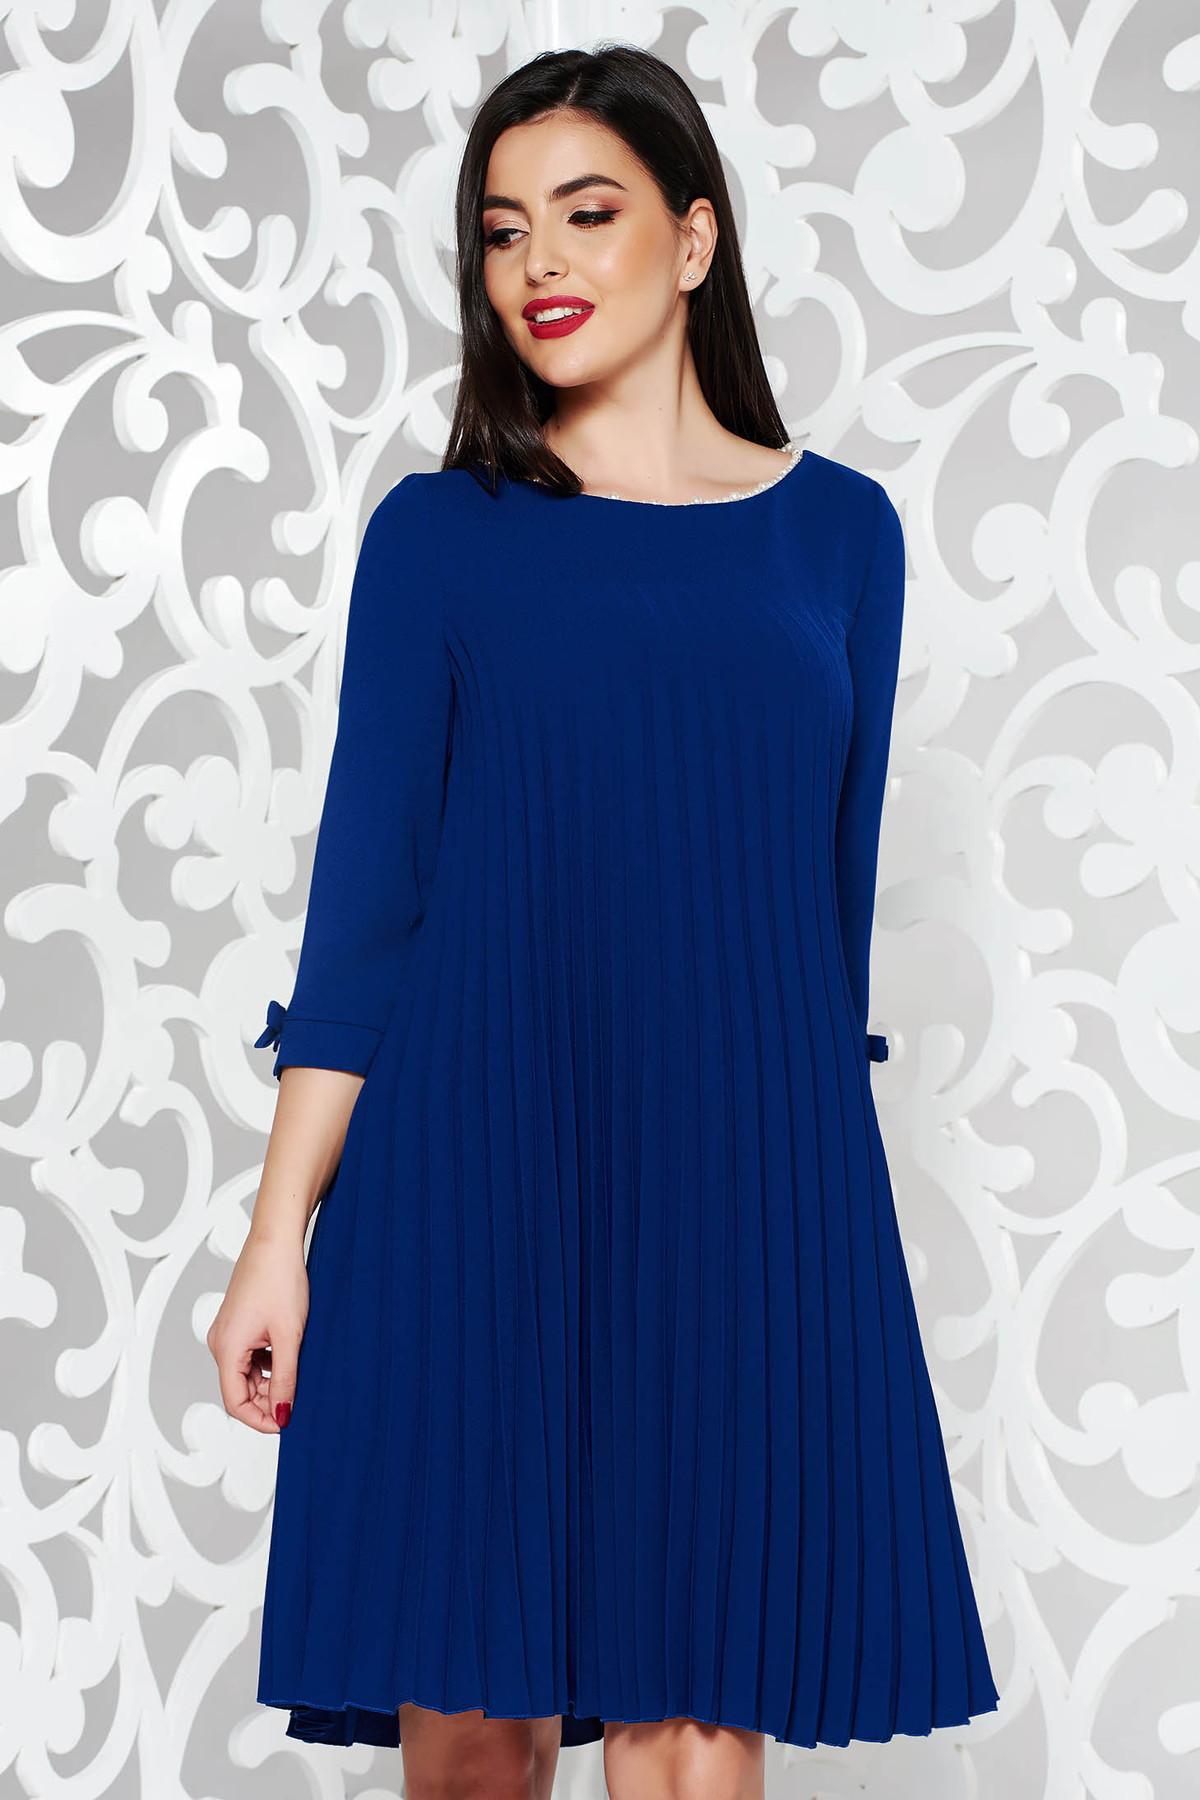 Rochie albastra eleganta cu croi larg din stofa neelastica plisata cu aplicatii cu perle